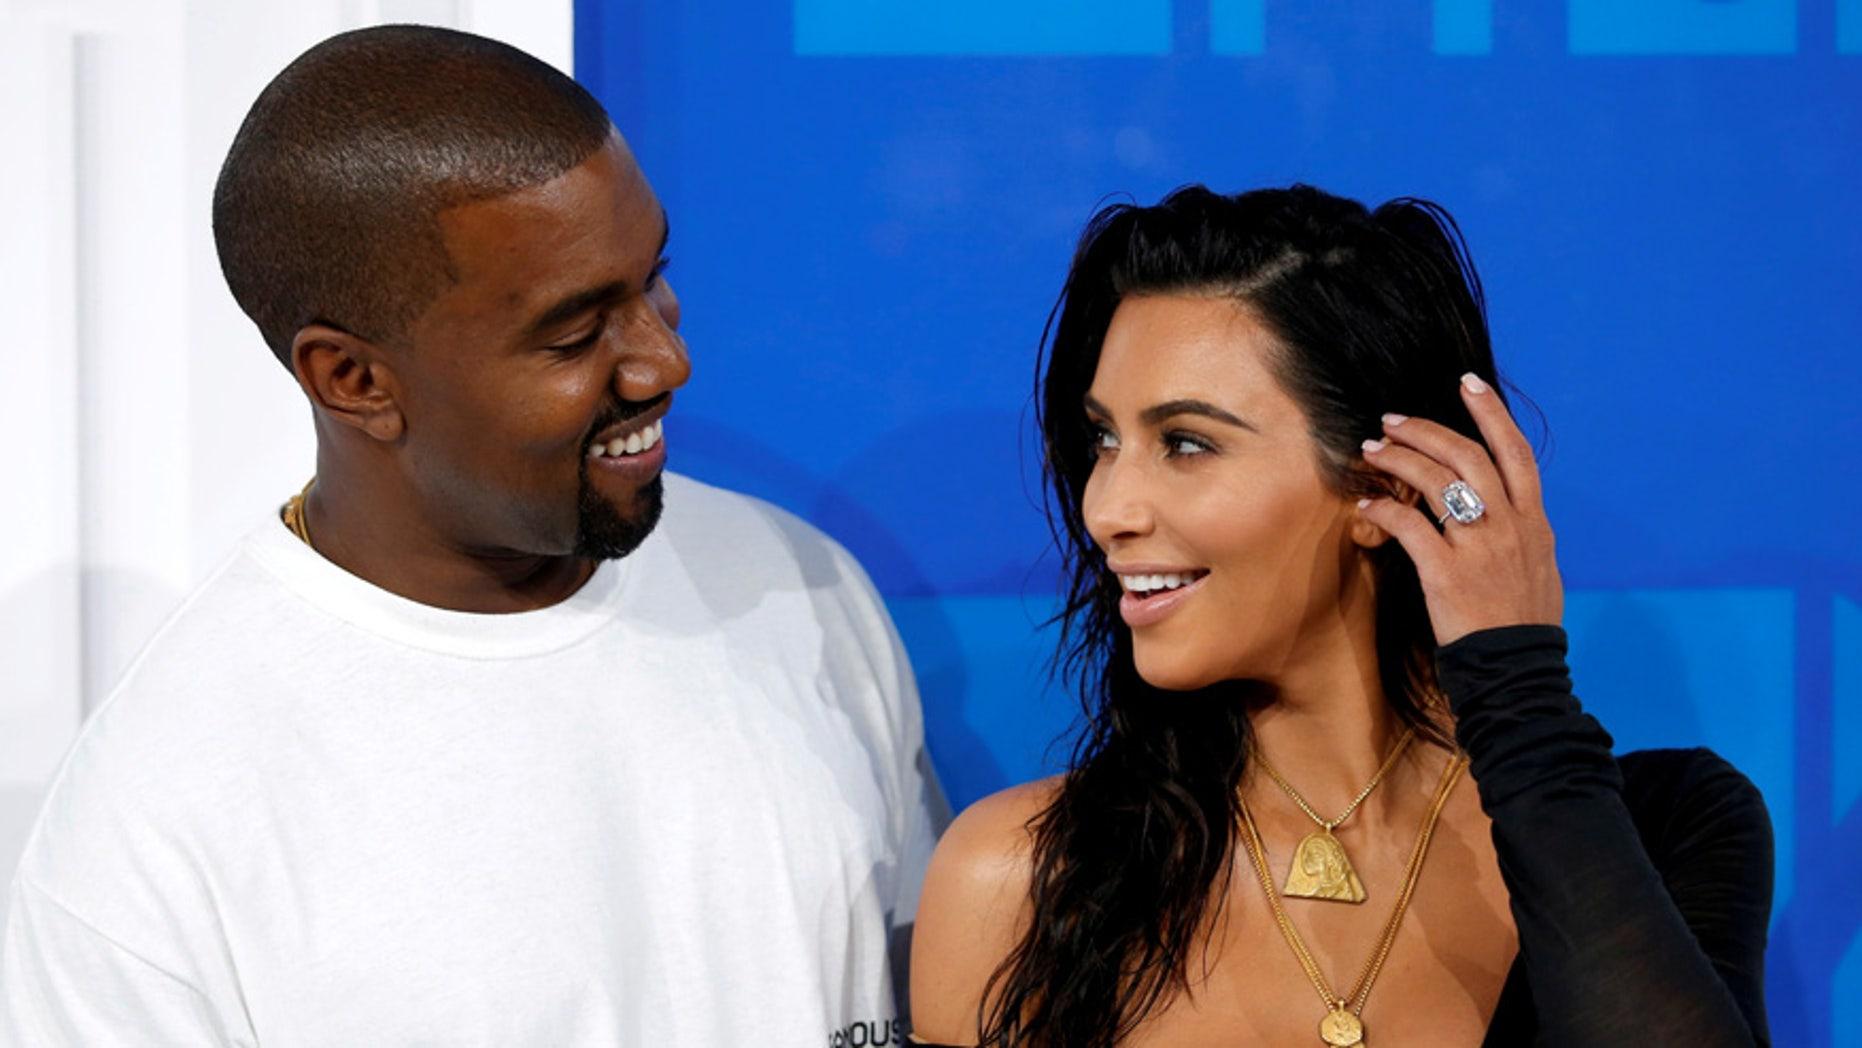 FILE PHOTO - Kim Kardashian and Kanye West arrive at the 2016 MTV Video Music Awards in New York, U.S., August 28, 2016. (REUTERS/Eduardo Munoz)